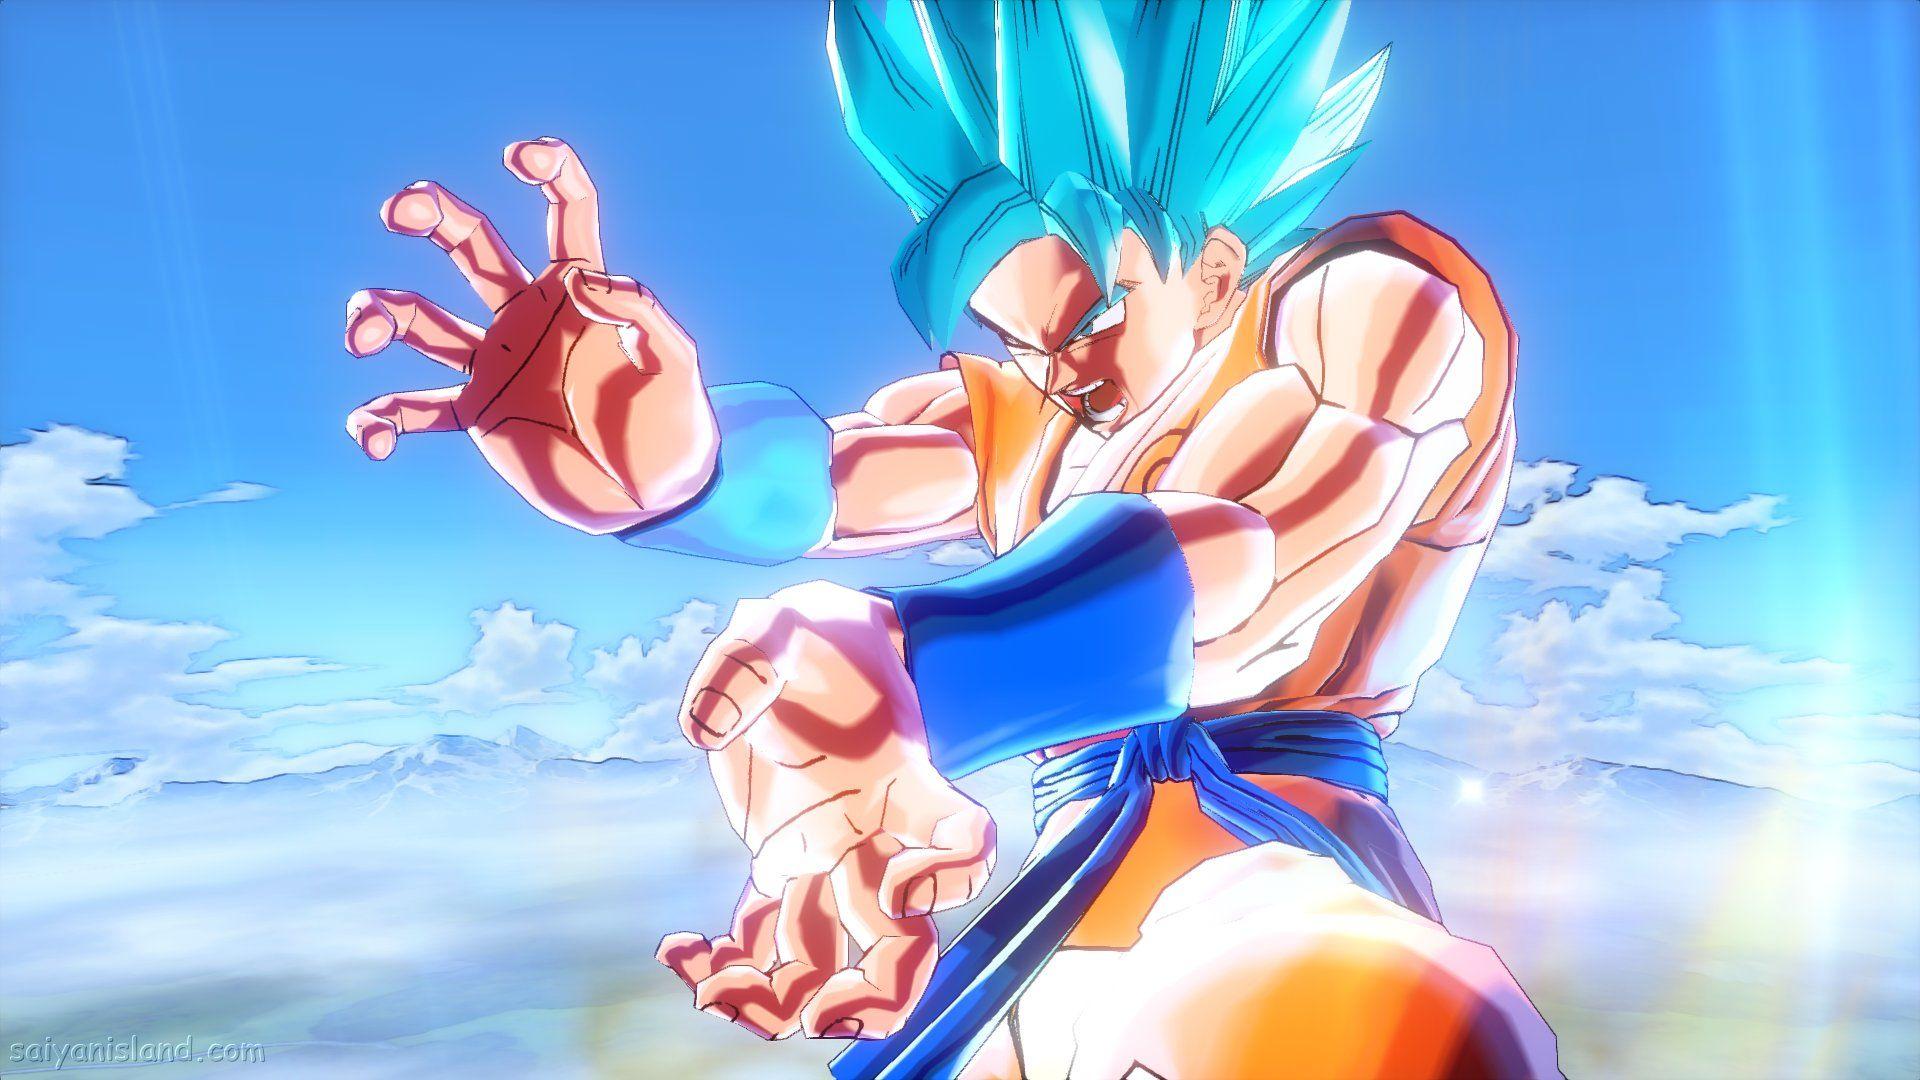 Latest 1920 1080 Goku Super Saiyan God Dragon Ball Z Goku